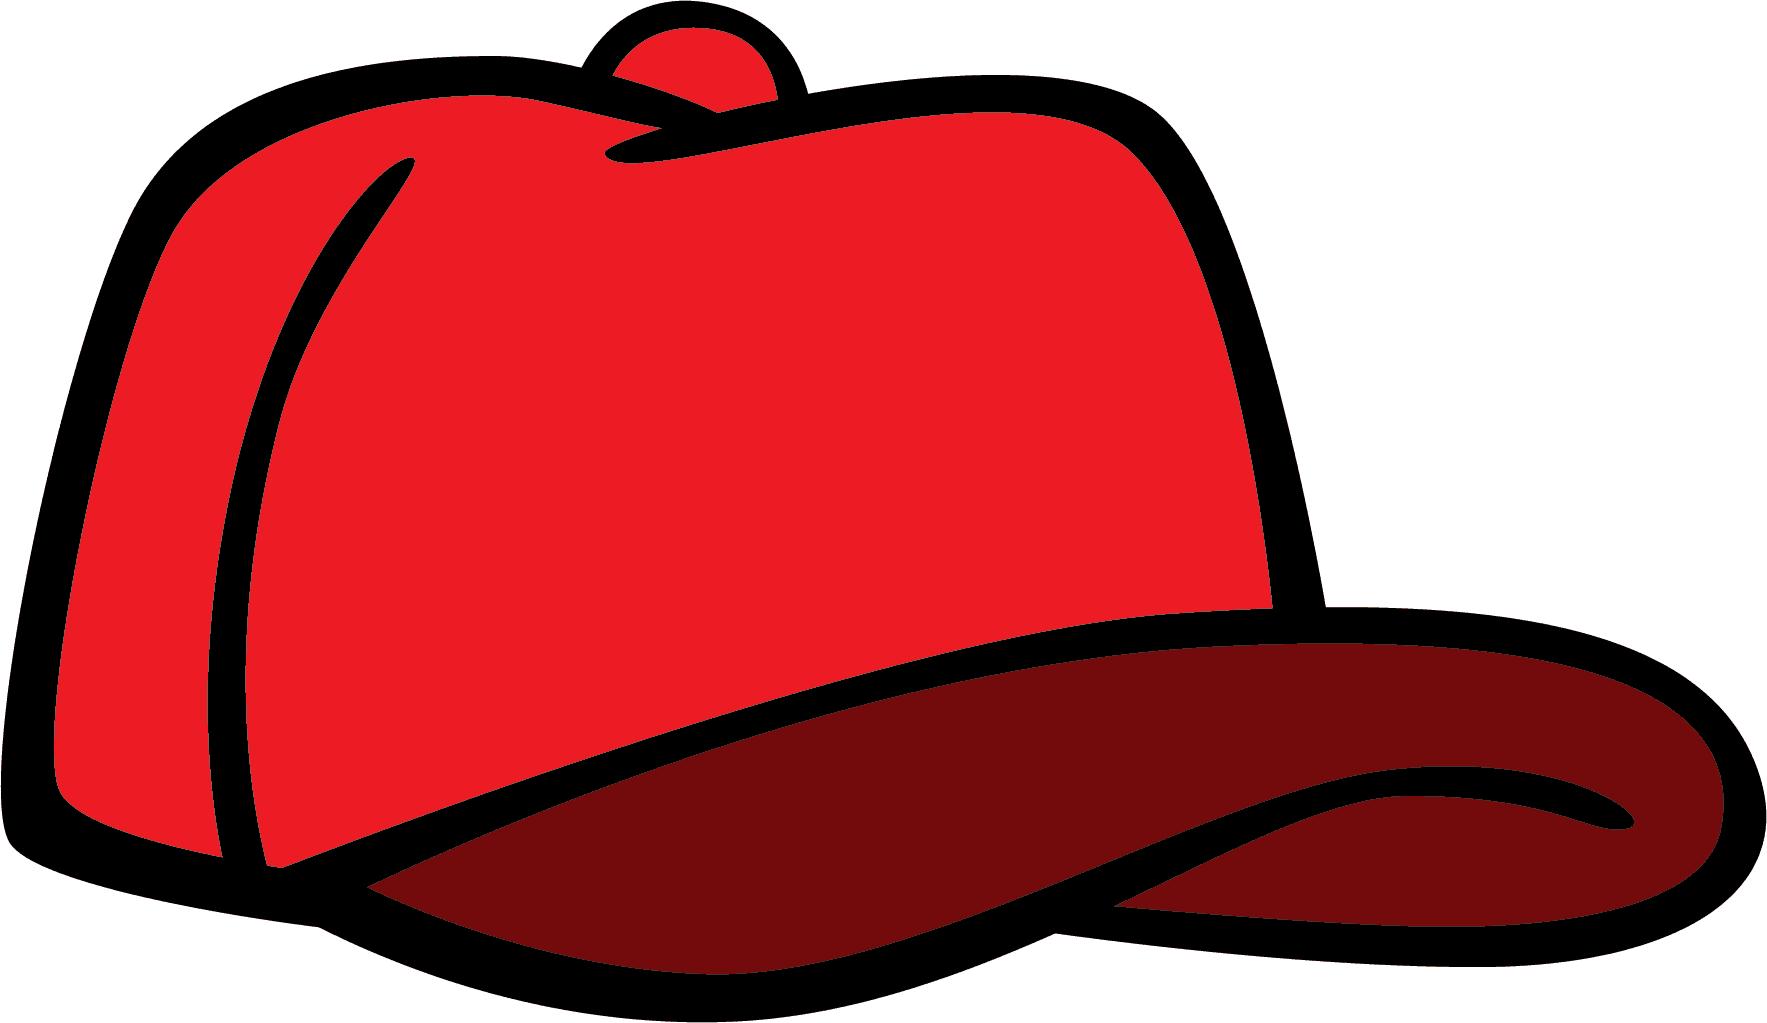 Baseball hat baseball cap clipart 4-Baseball hat baseball cap clipart 4-18